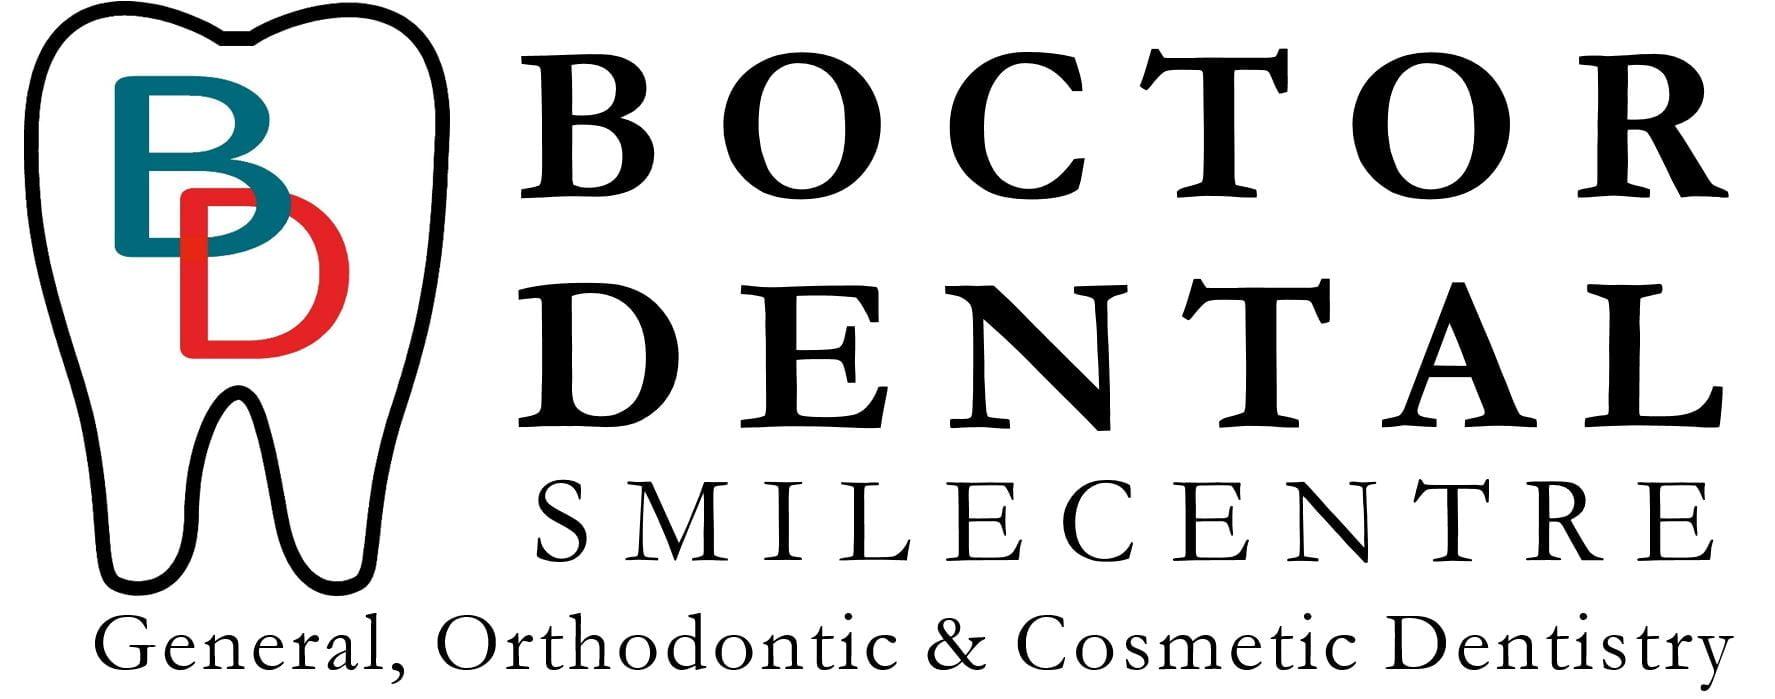 Bd Smilecentre 2 Smilecentre